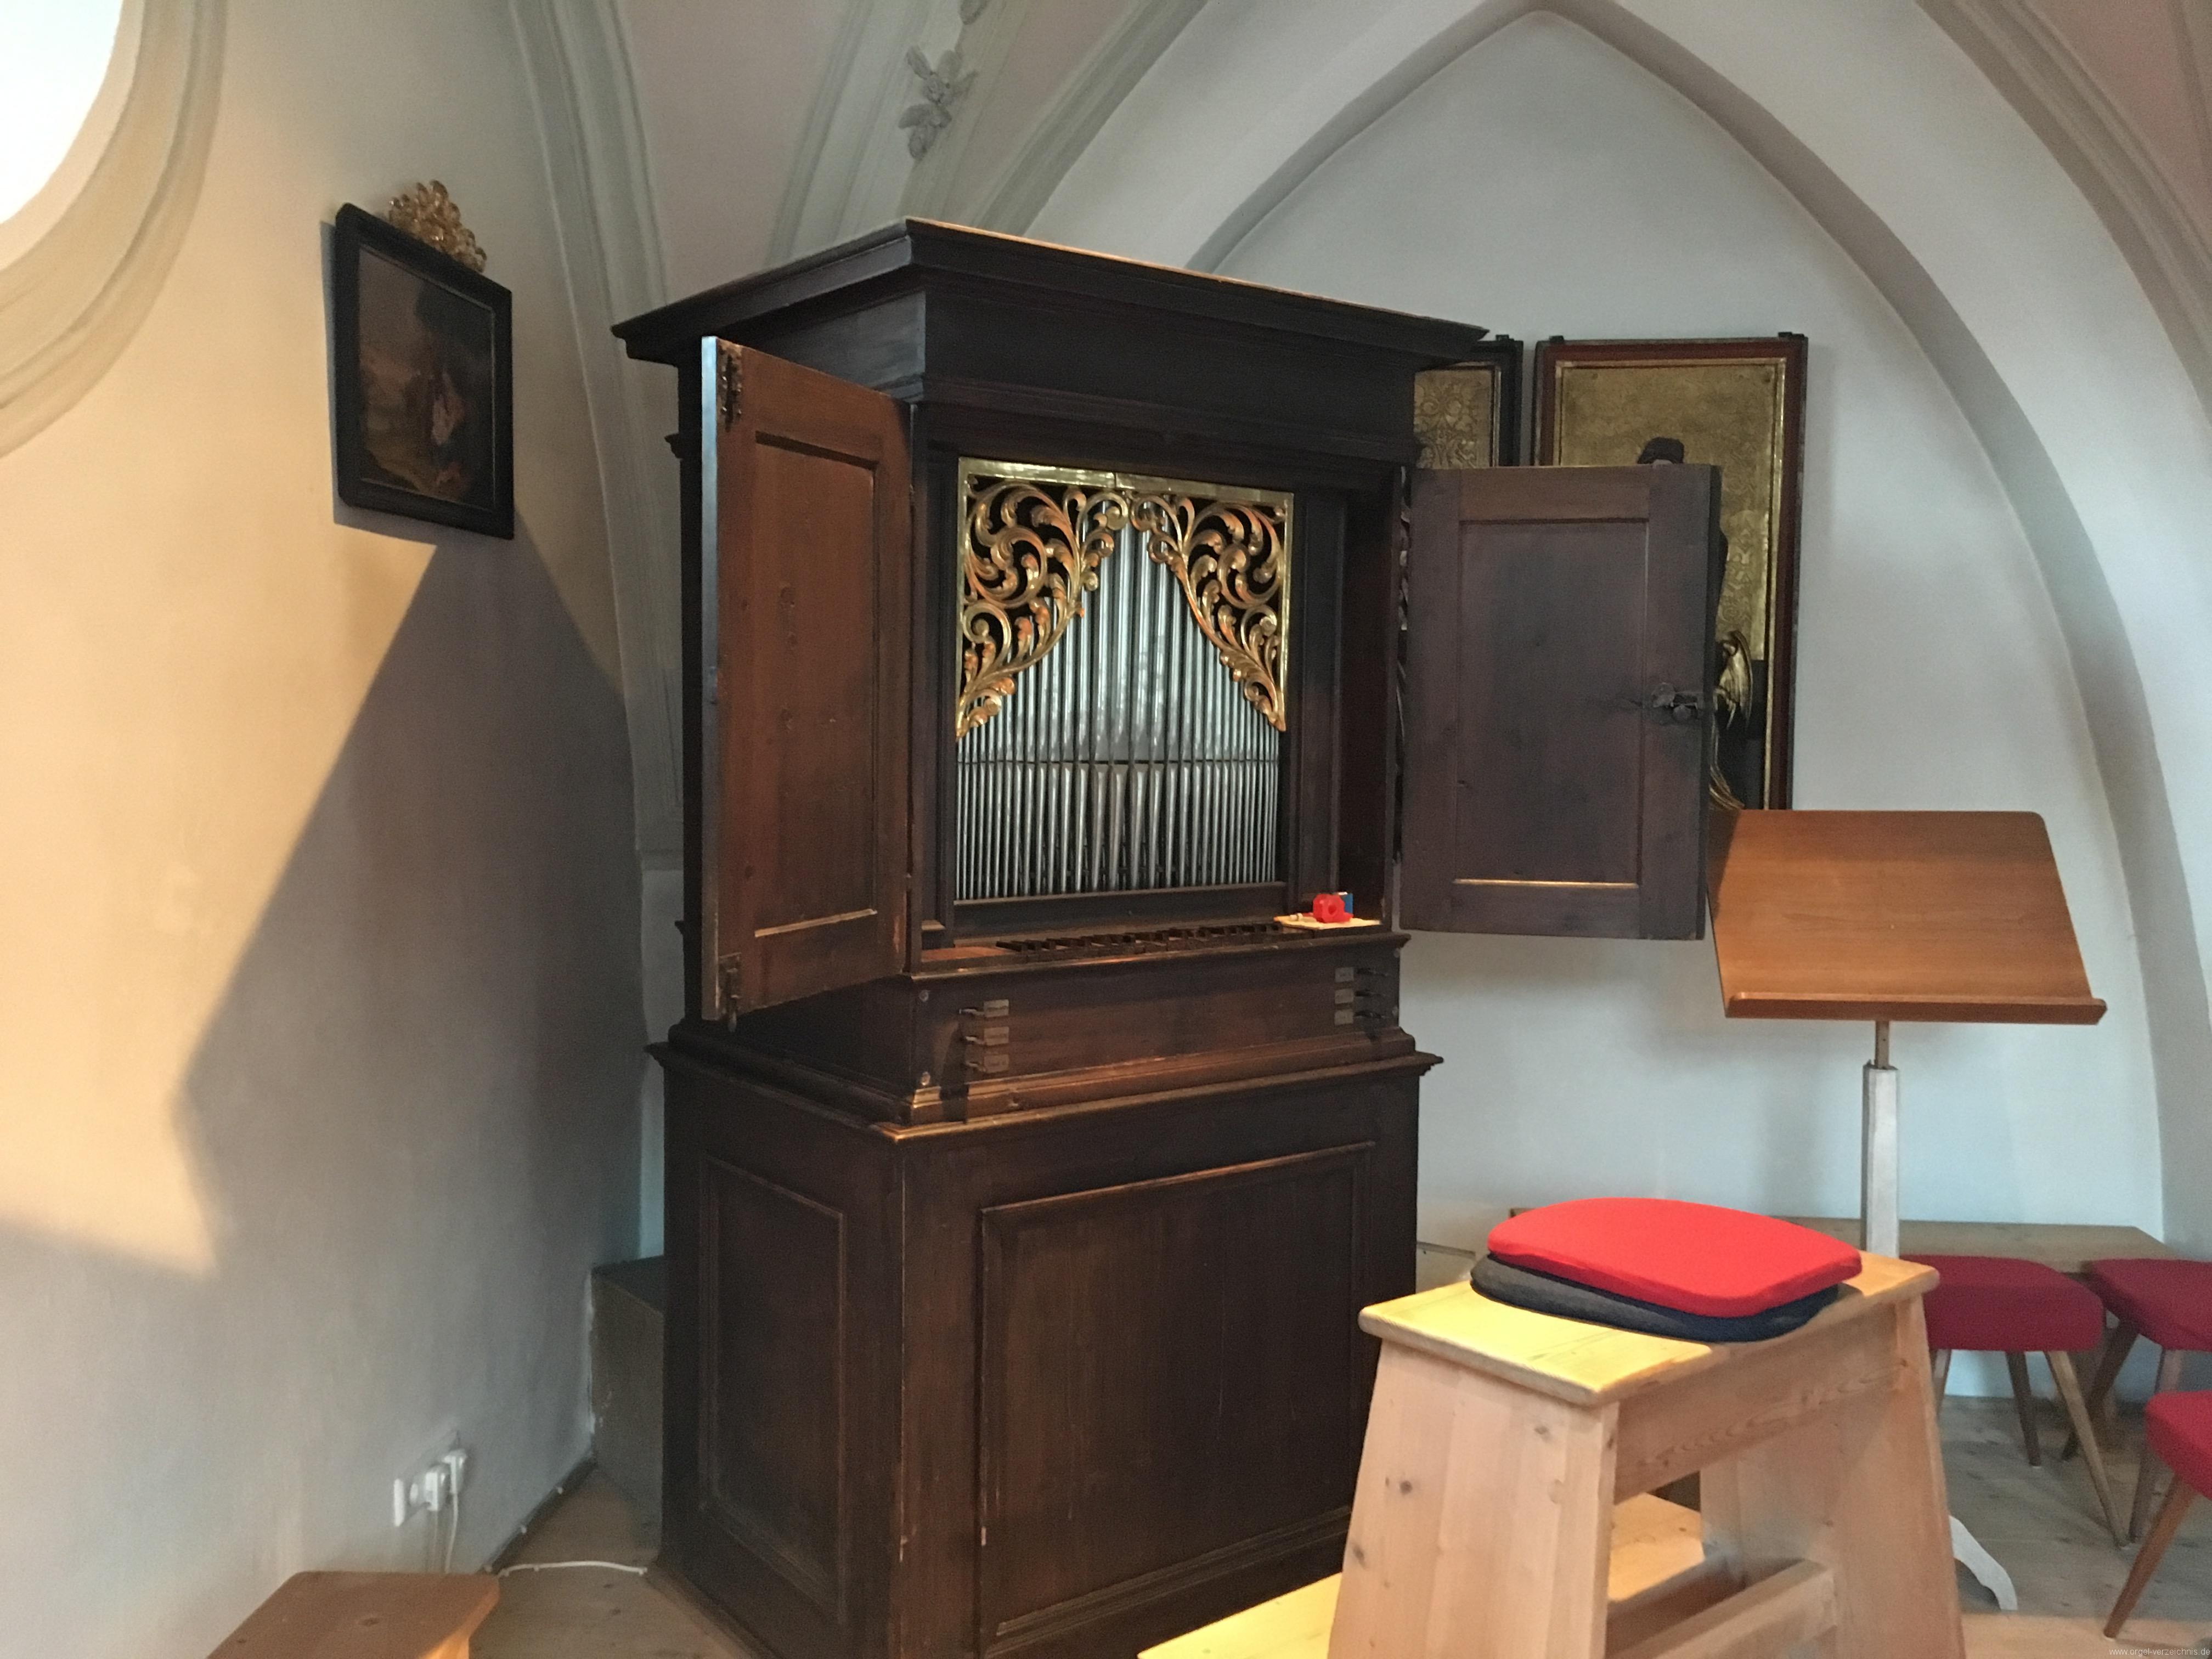 lans-pfarrkirche-st-lambert-20-orgel